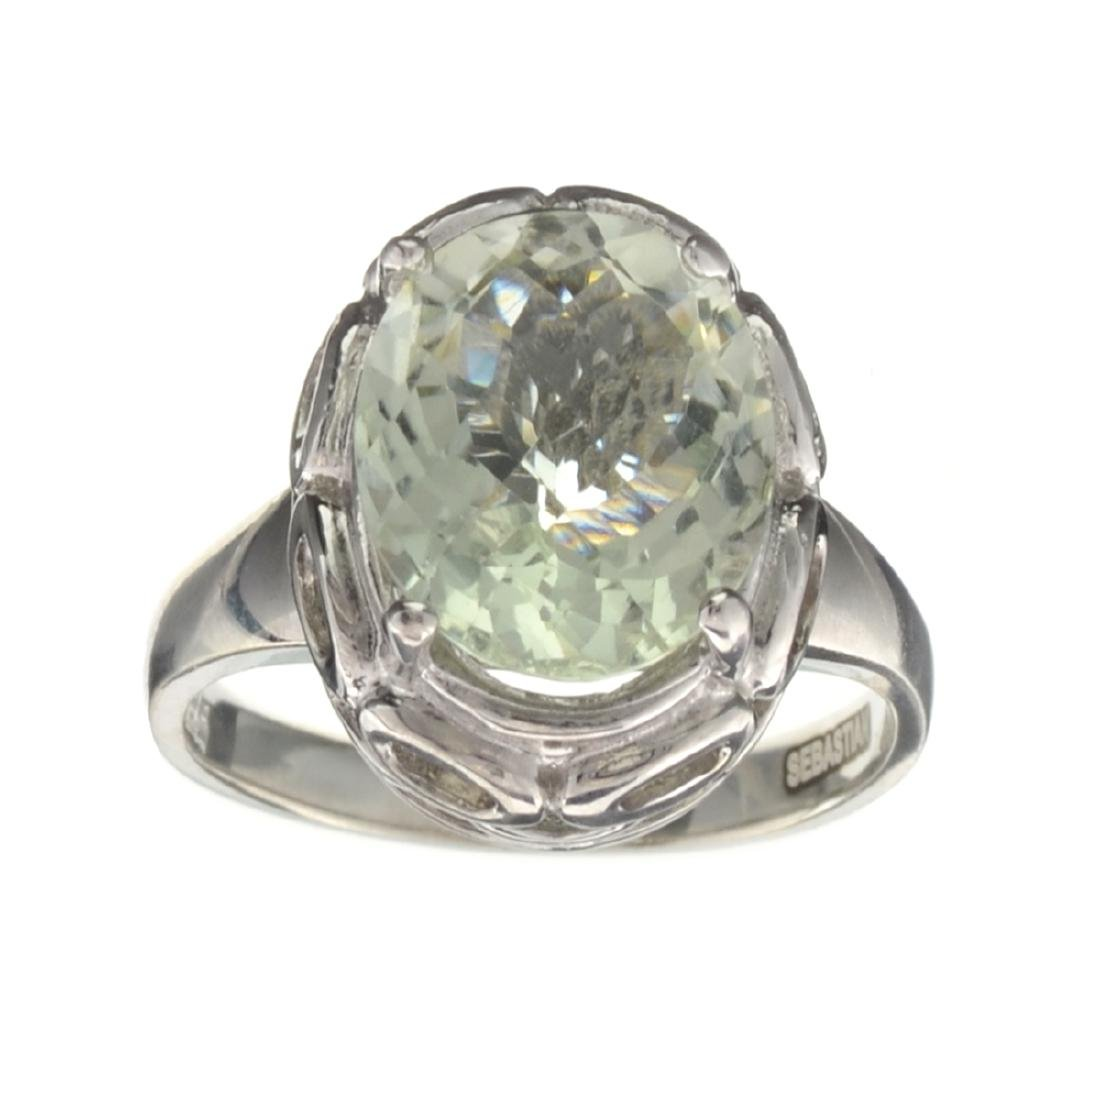 APP: 0.5k Fine Jewelry Designer Sebastian, 4.36CT Oval